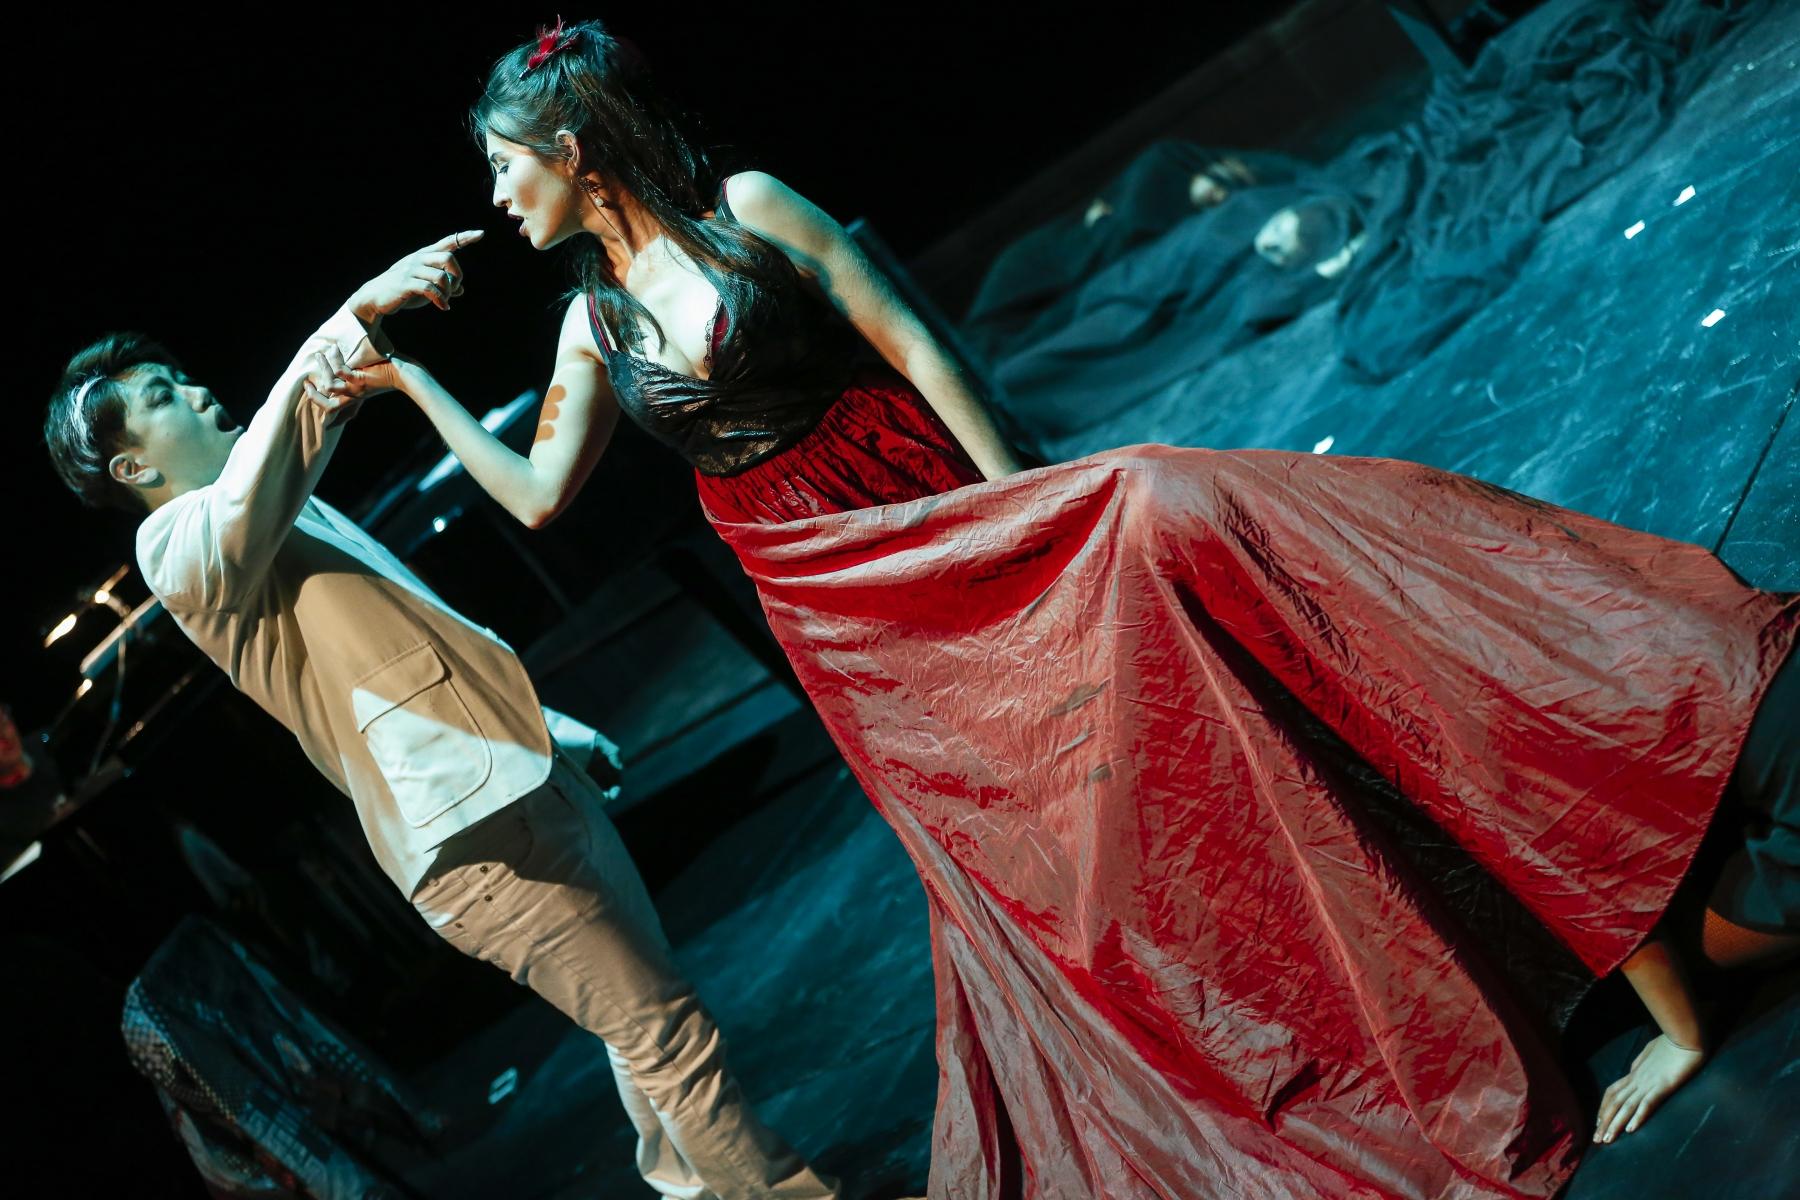 2014-06-02-danse-macabre-MDW-267